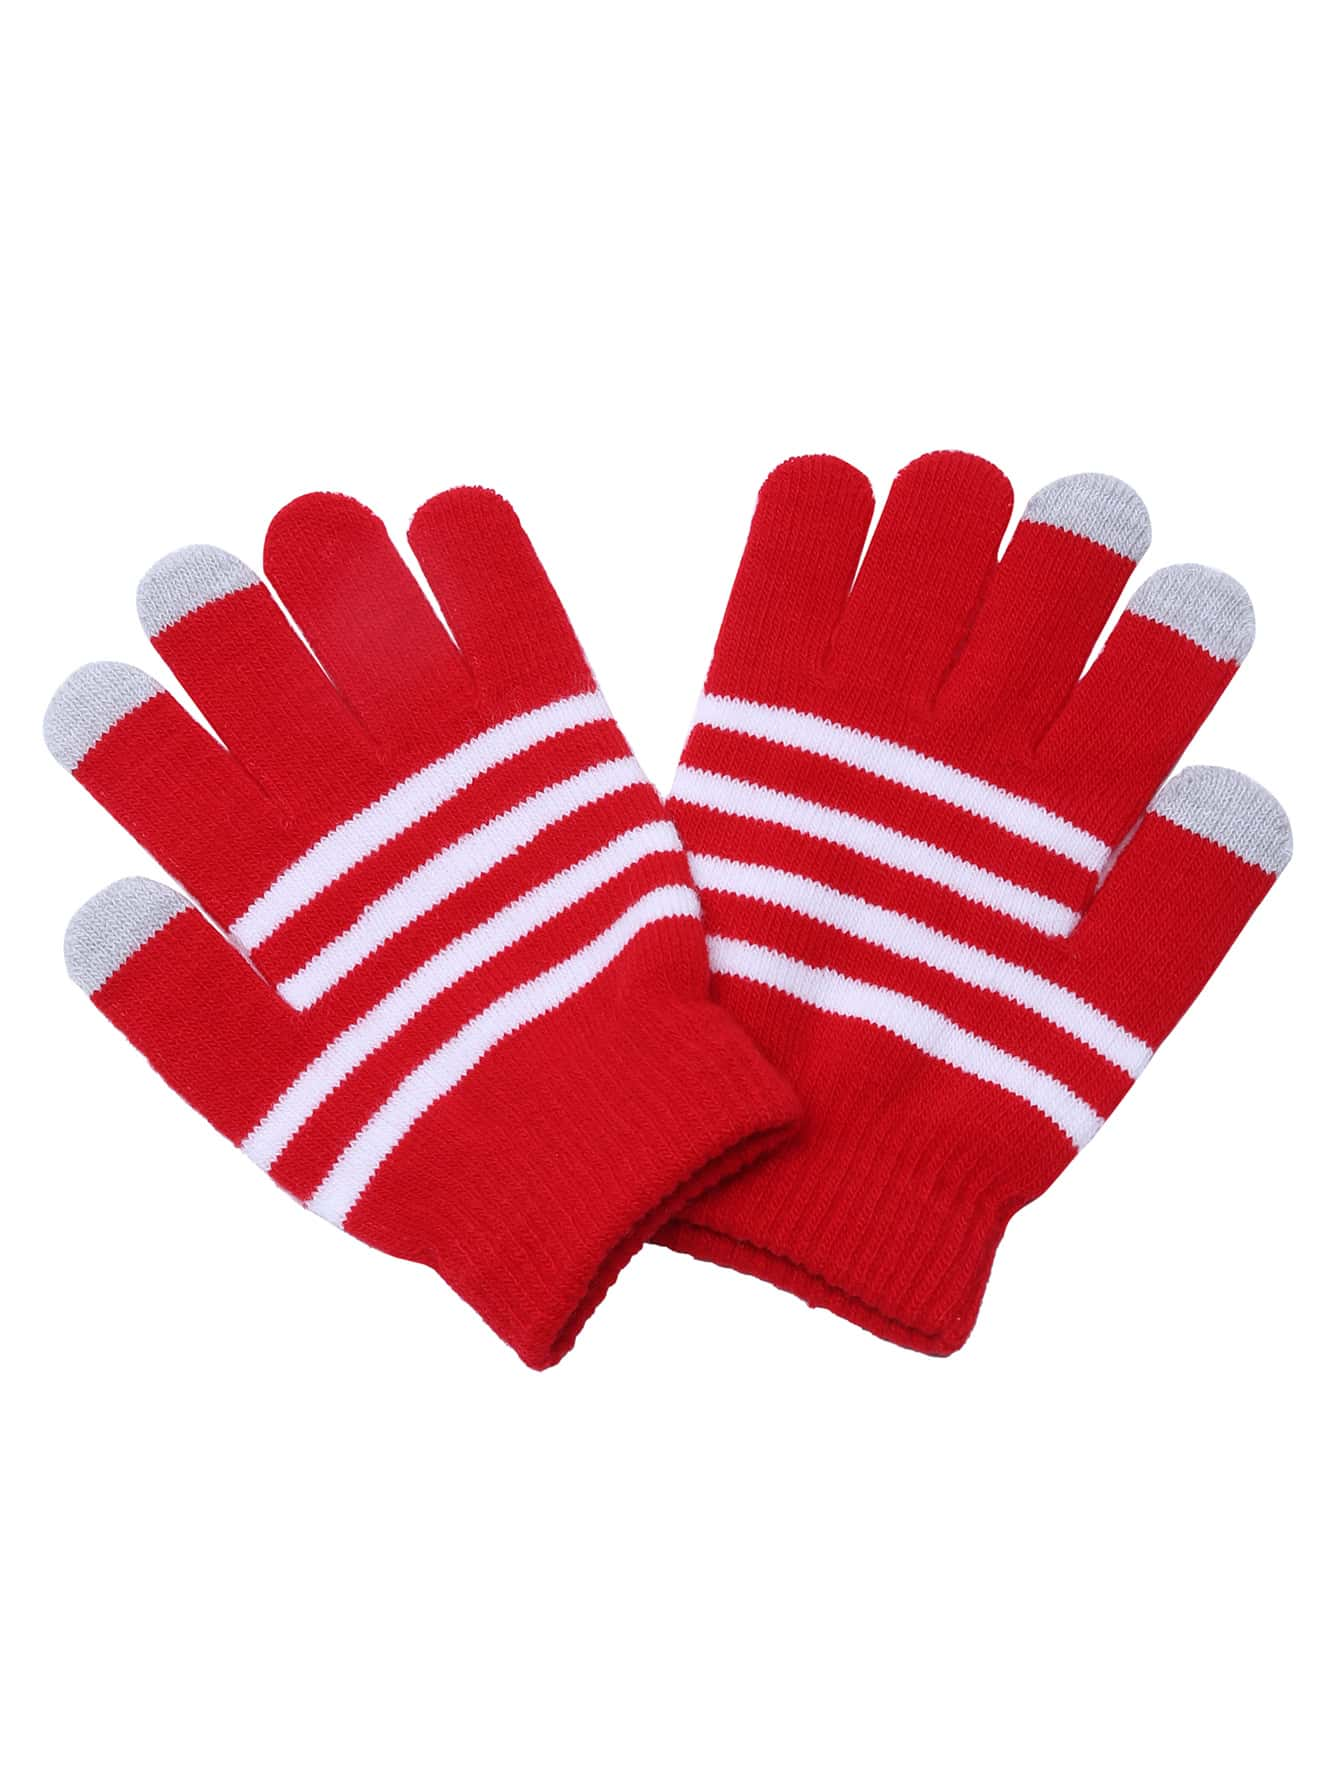 Фото Red Striped Knit Textured Telefingers Gloves. Купить с доставкой